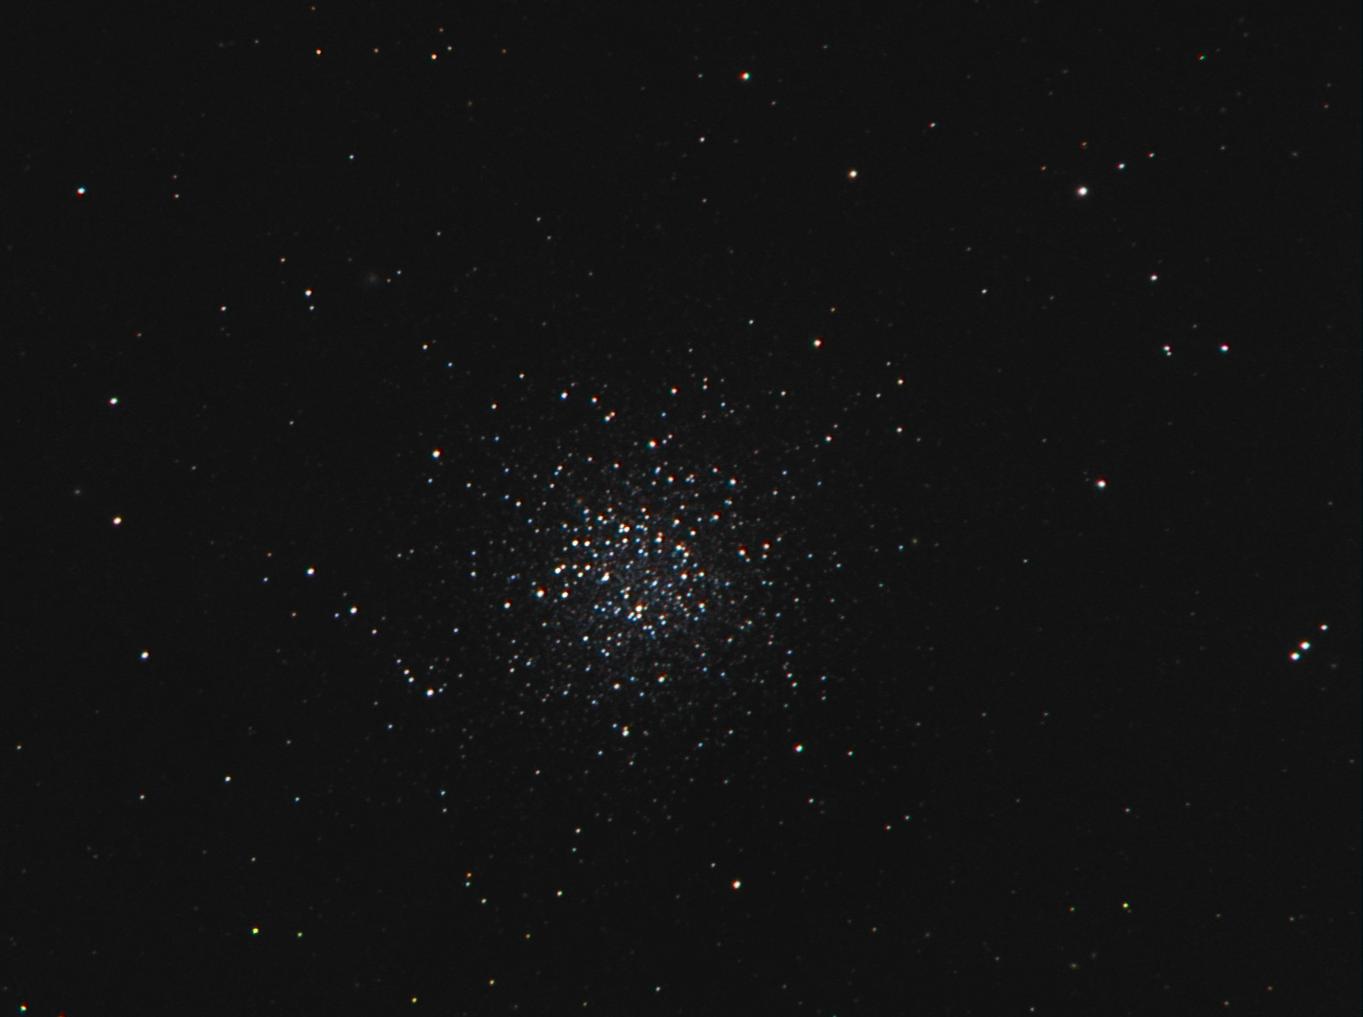 NGC5466-C8-red0.5optec-atik16hr-LRVB.png